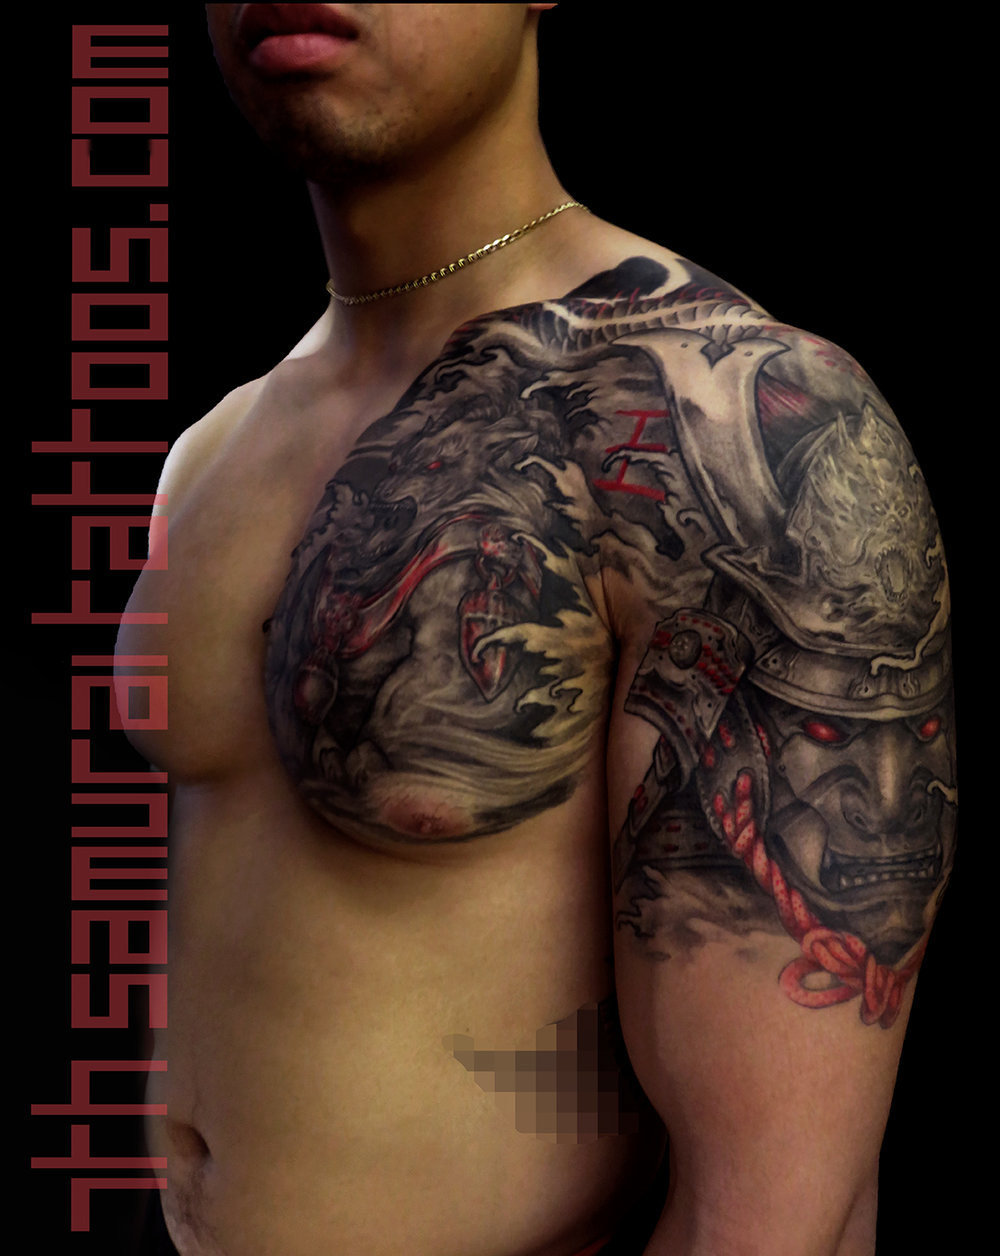 18.5 PORT brian vuong fudog samurai arowana 7th tattoos Kai men's chest 16may20 IMG_1744  TIFF1 levels more contrast 3.5 16sep9.jpg